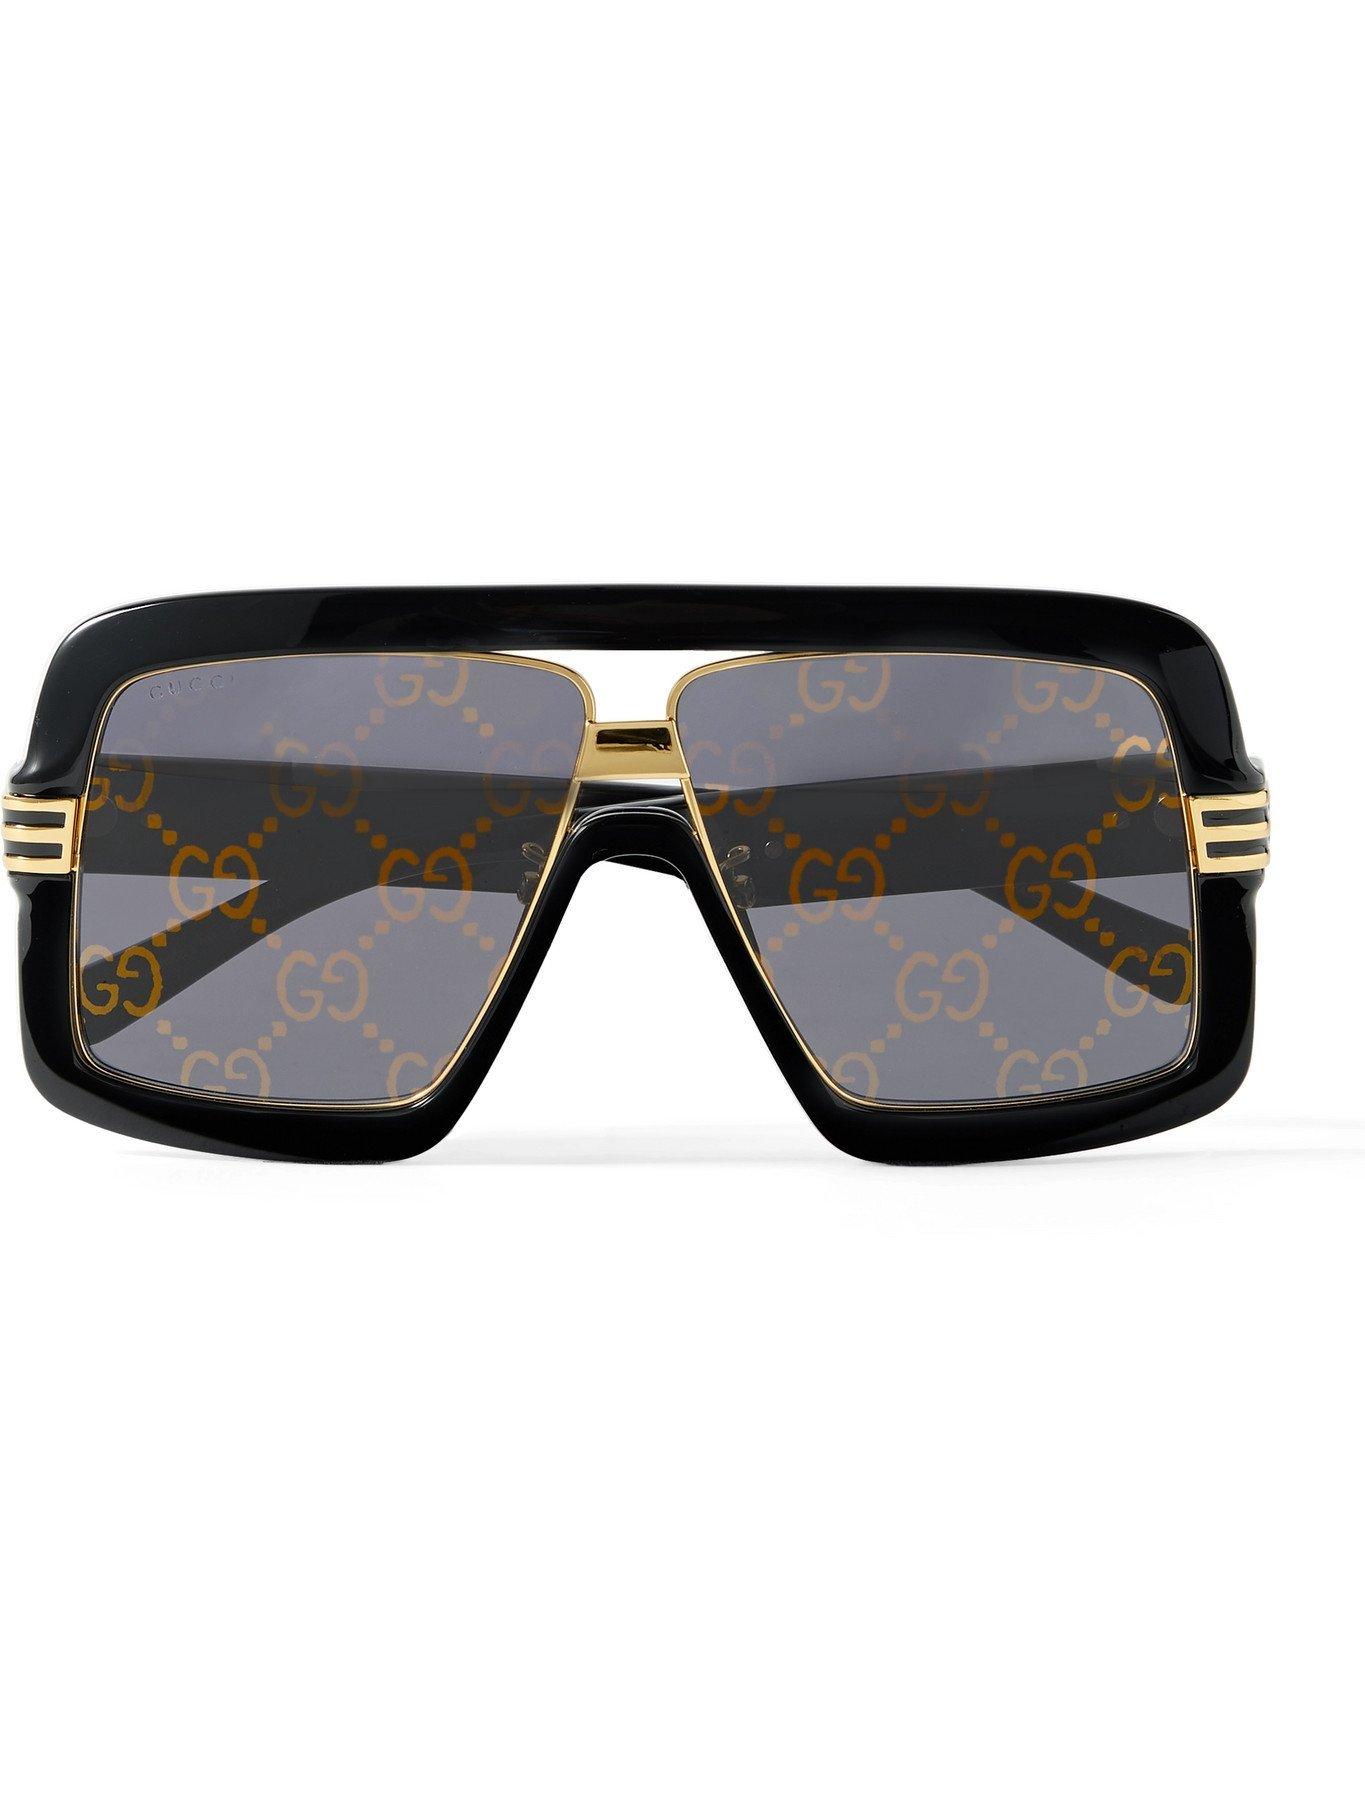 Photo: GUCCI - Oversized Square-Frame Tortoiseshell Acetate and Gold-Tone Sunglasses - Black